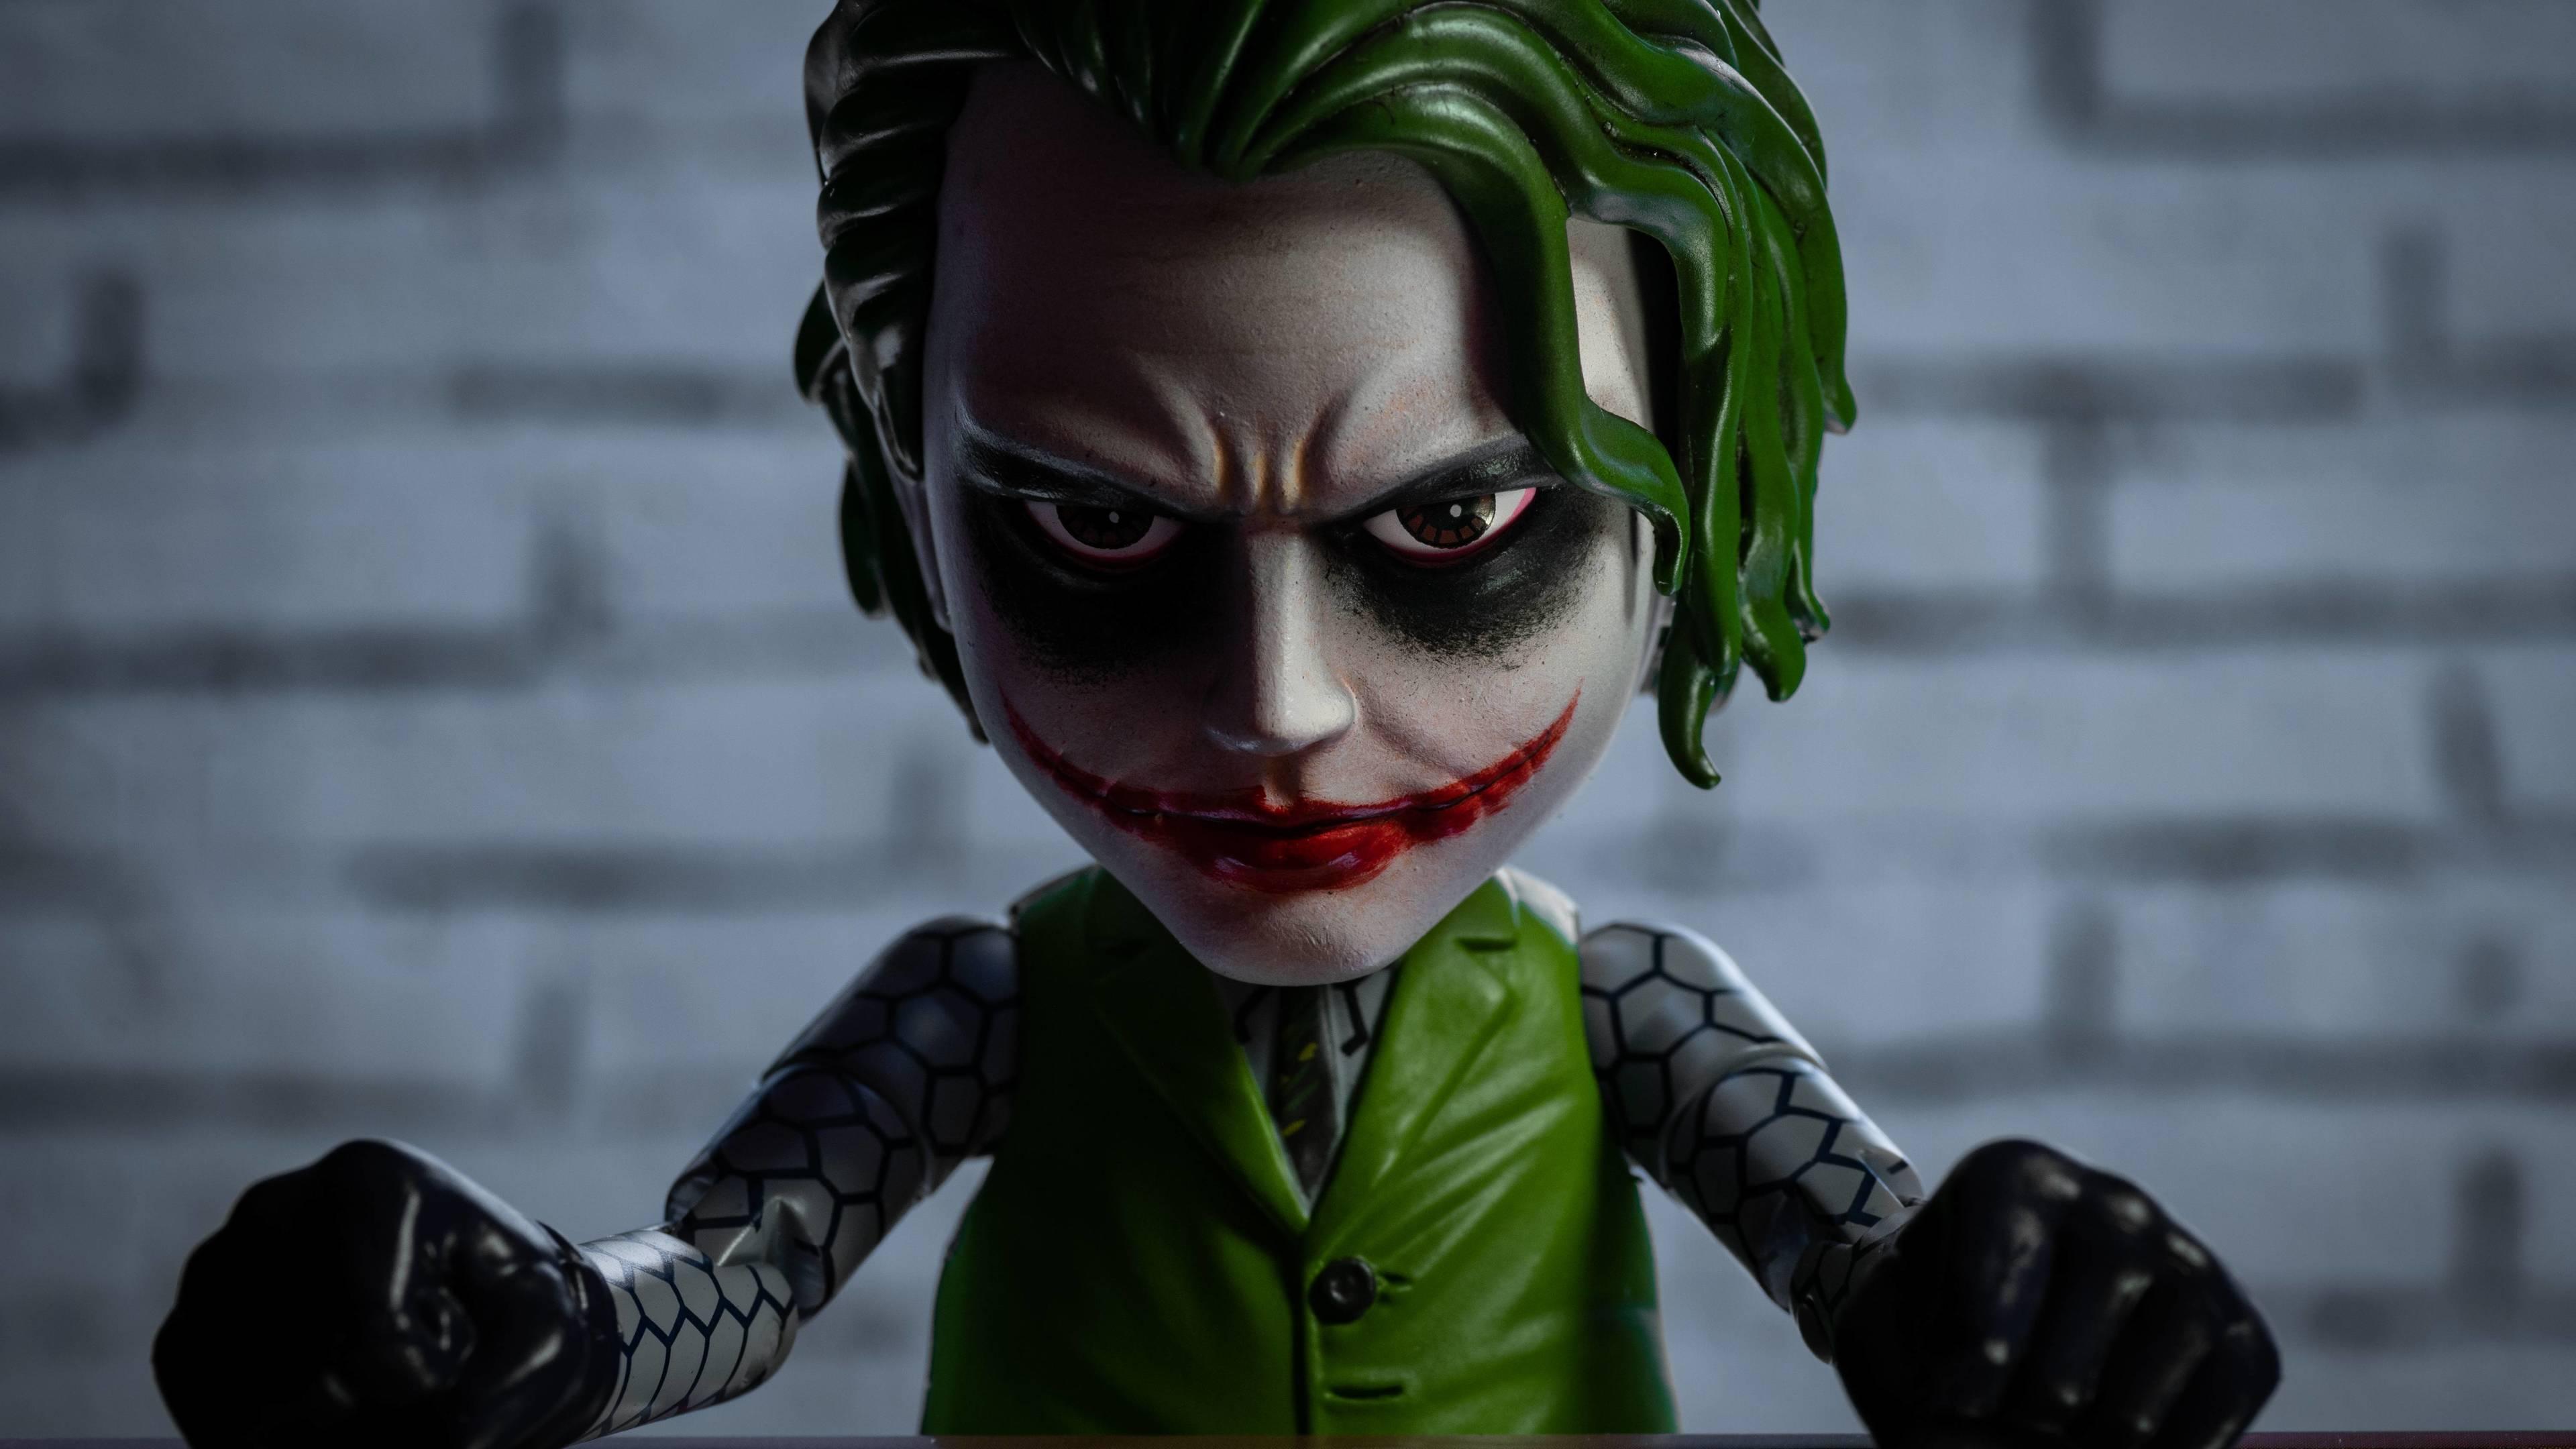 little joker 1570918582 - Little Joker - supervillain wallpapers, superheroes wallpapers, joker wallpapers, hd-wallpapers, 5k wallpapers, 4k-wallpapers